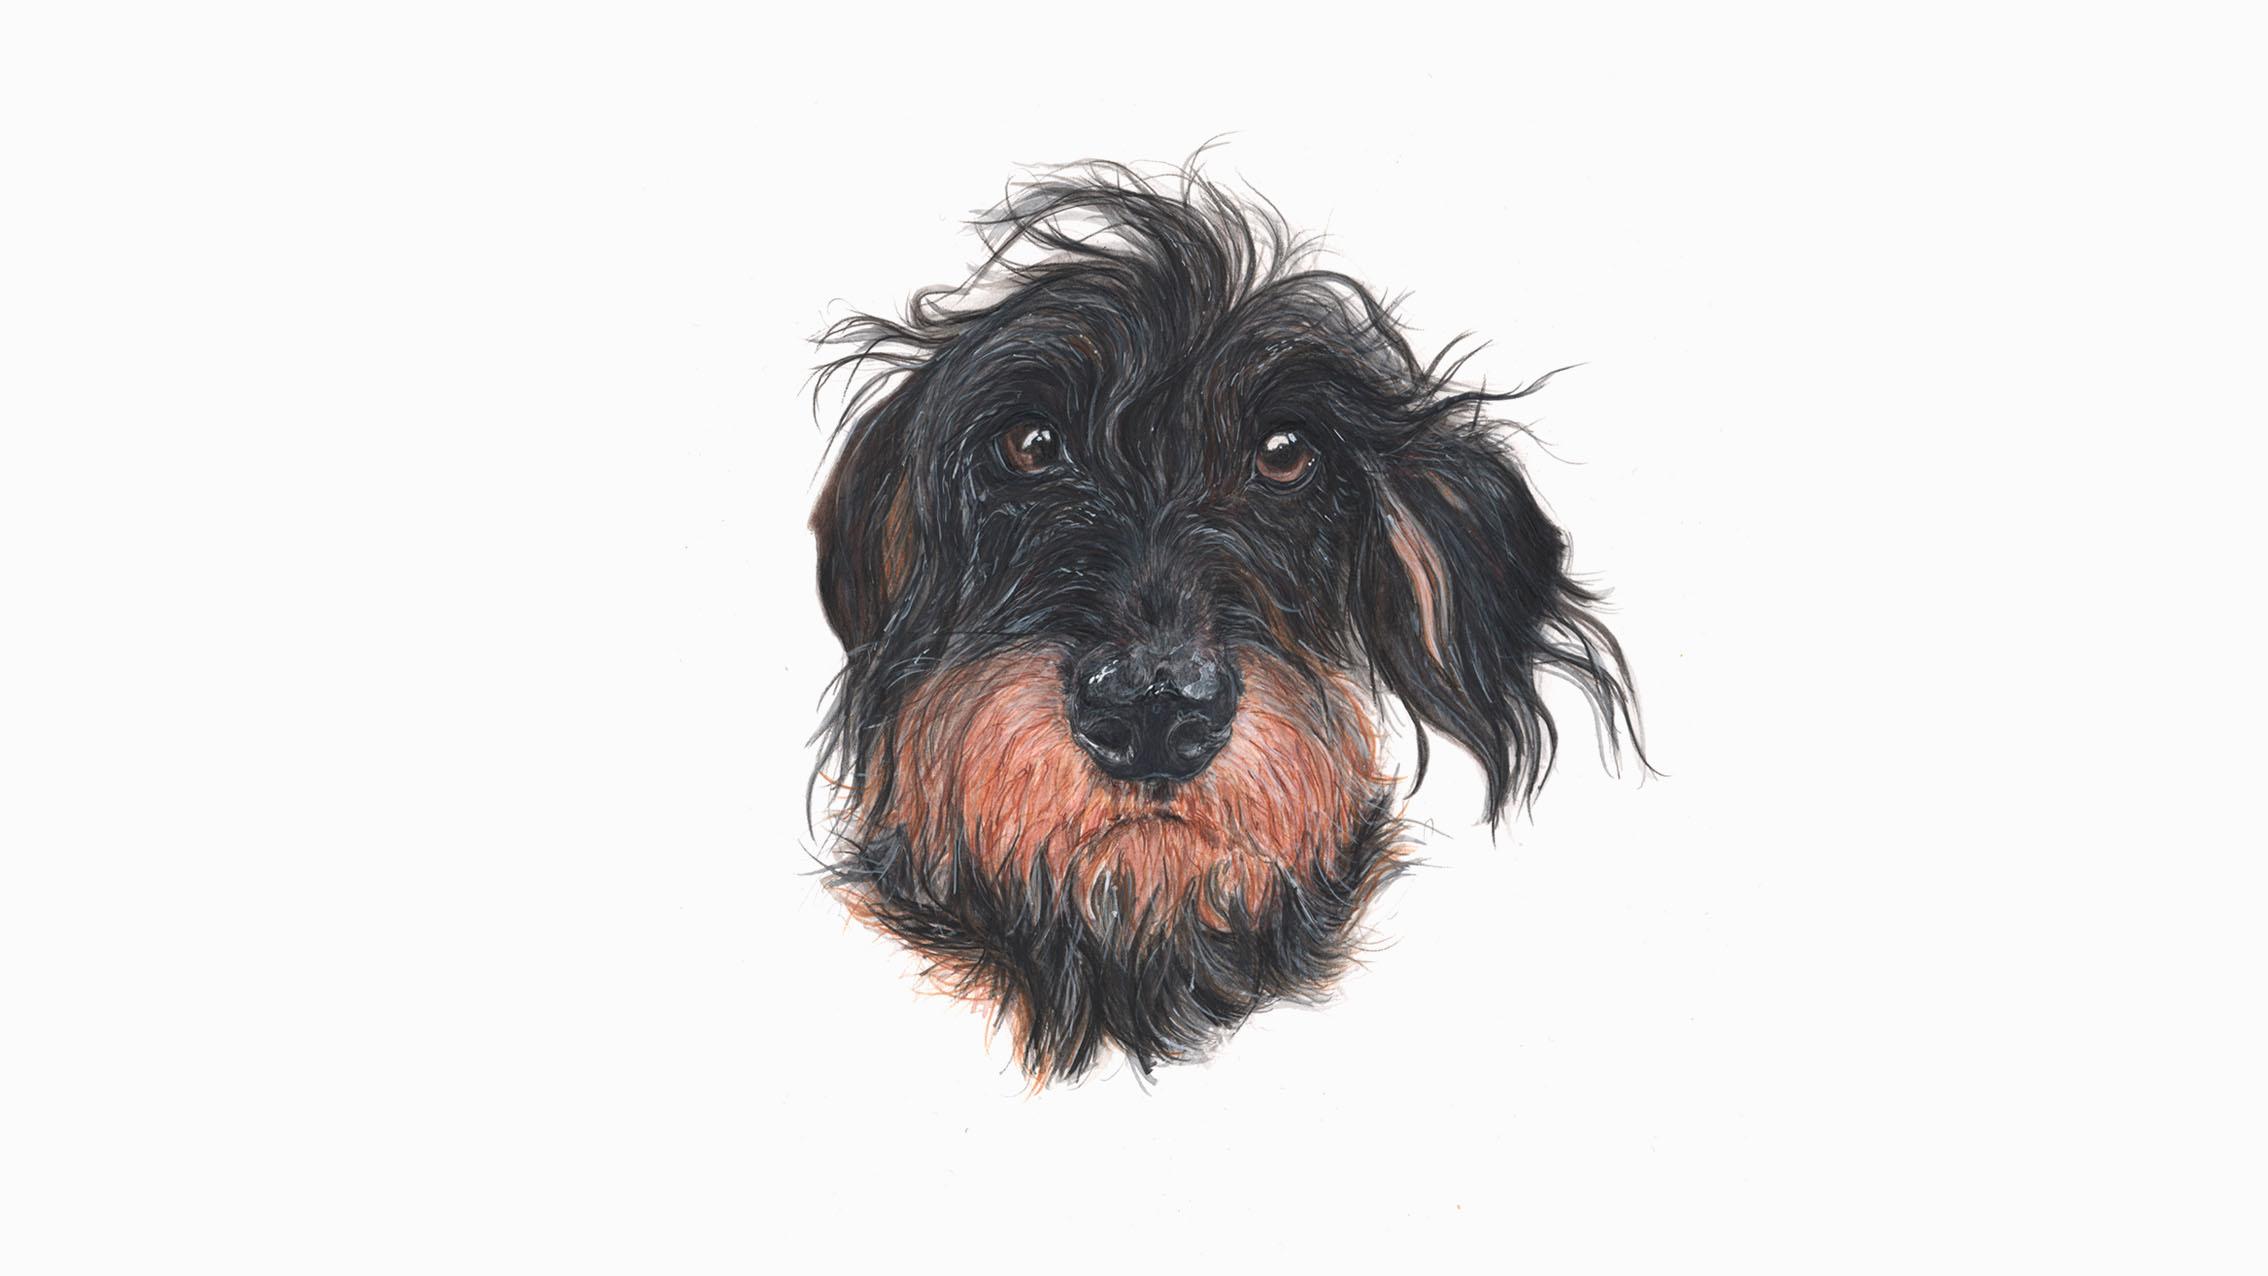 Monty, the Wire Haired Dachshund